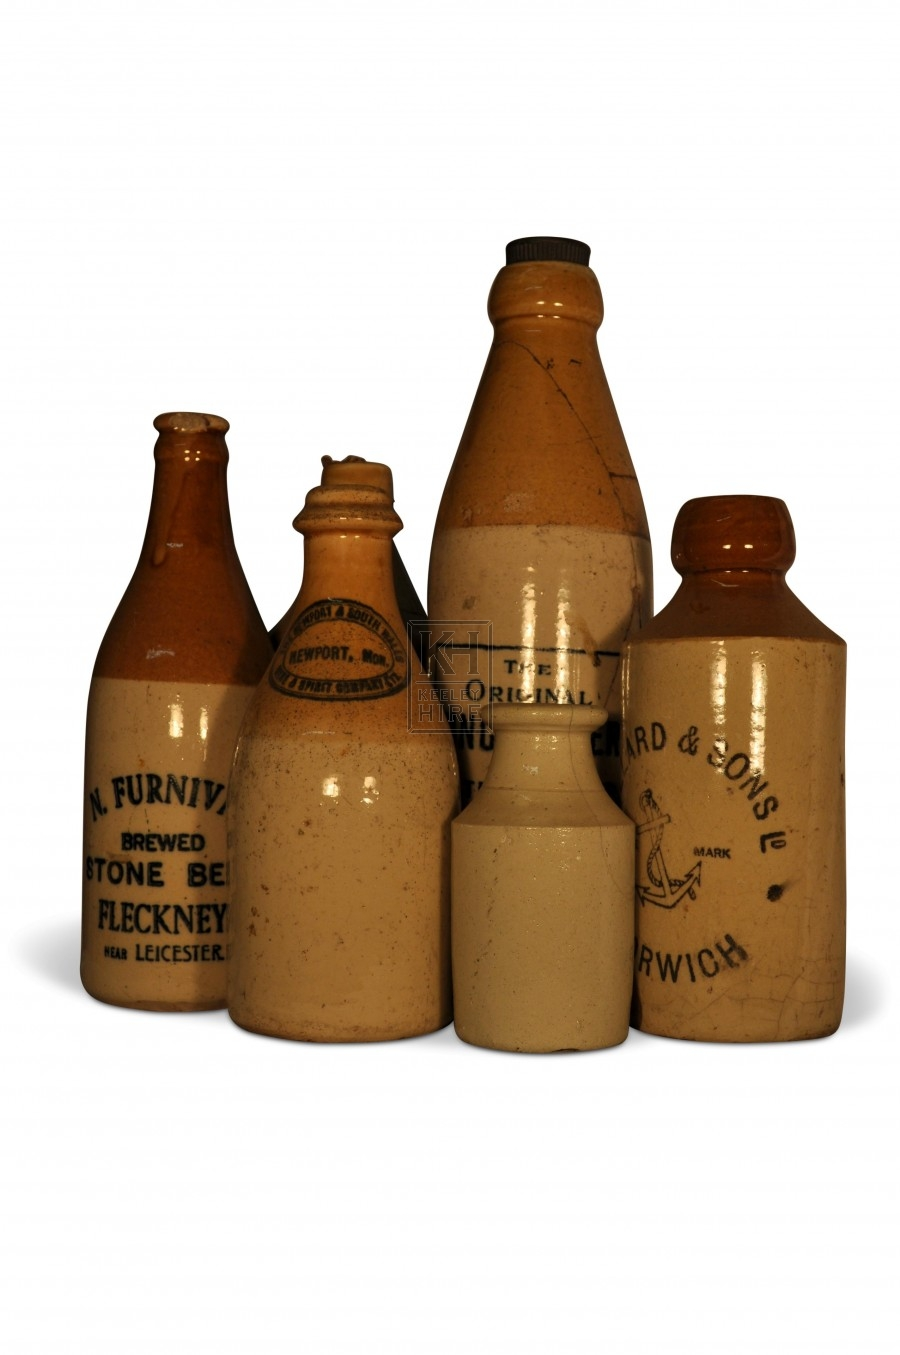 Earthenware bottles